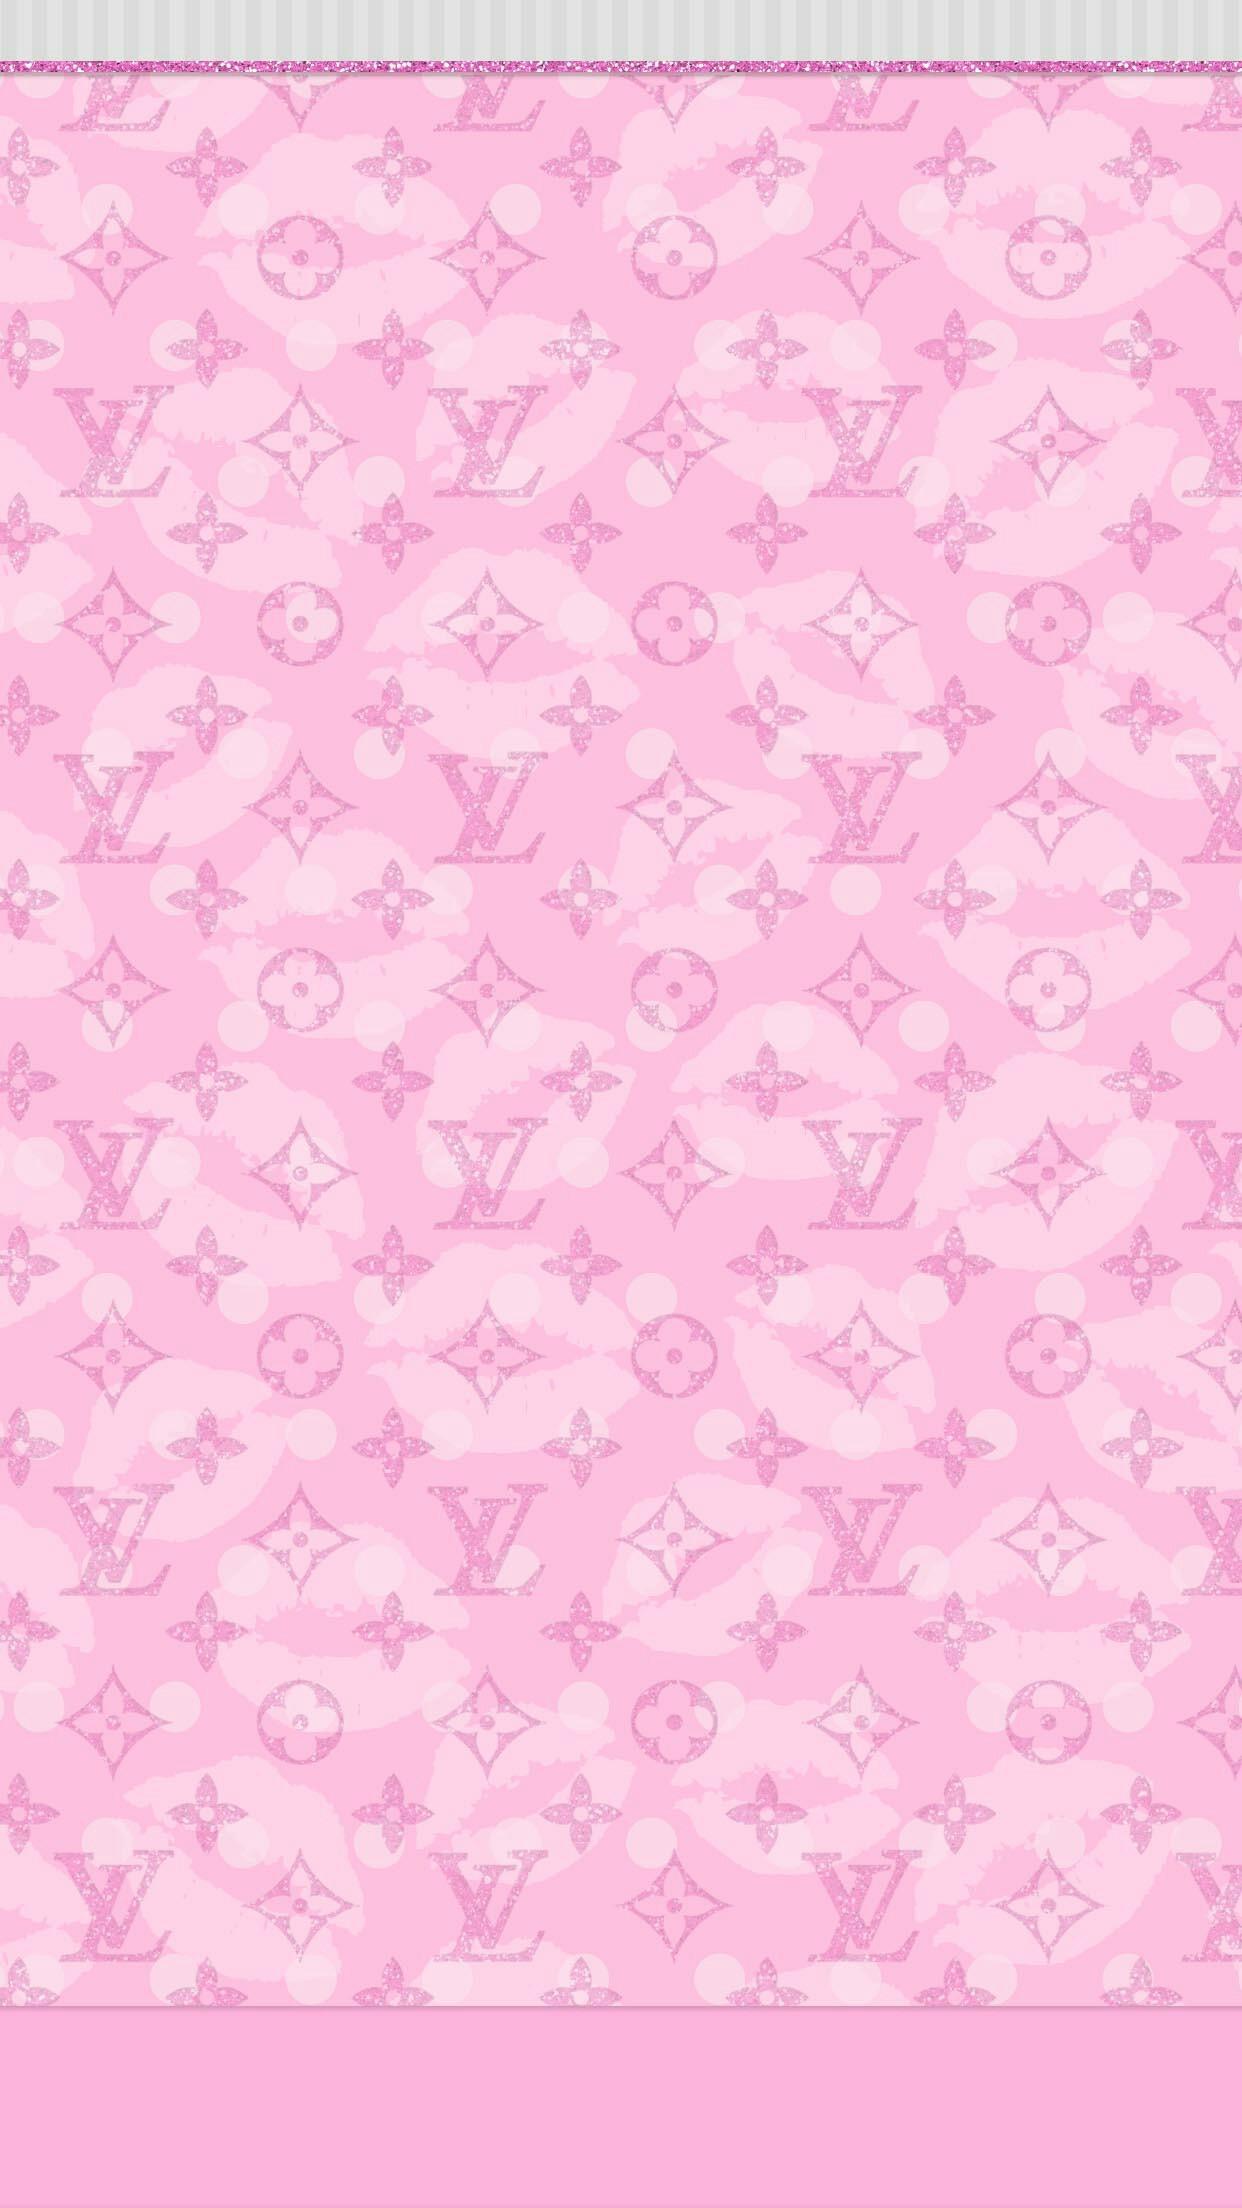 Free Monogram Wallpaper For Iphone Lv Wallpaper 72 Images